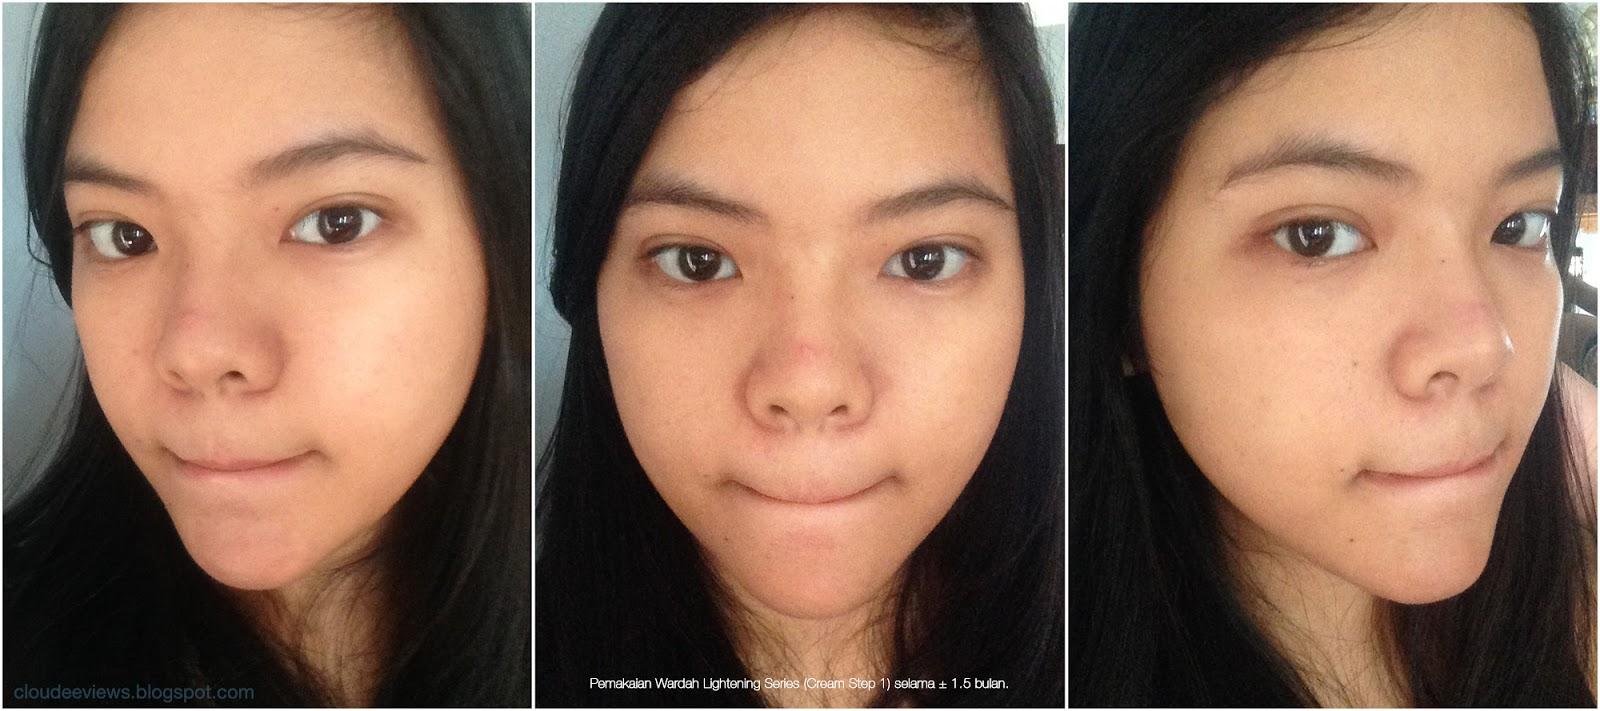 Skin Care Review Wardah Lightening Series My Daily Paket Kosmestik Step 2 Setelah 15 Bulan Memakai No Filter Edit Klik Untuk Memperbesar Gambar